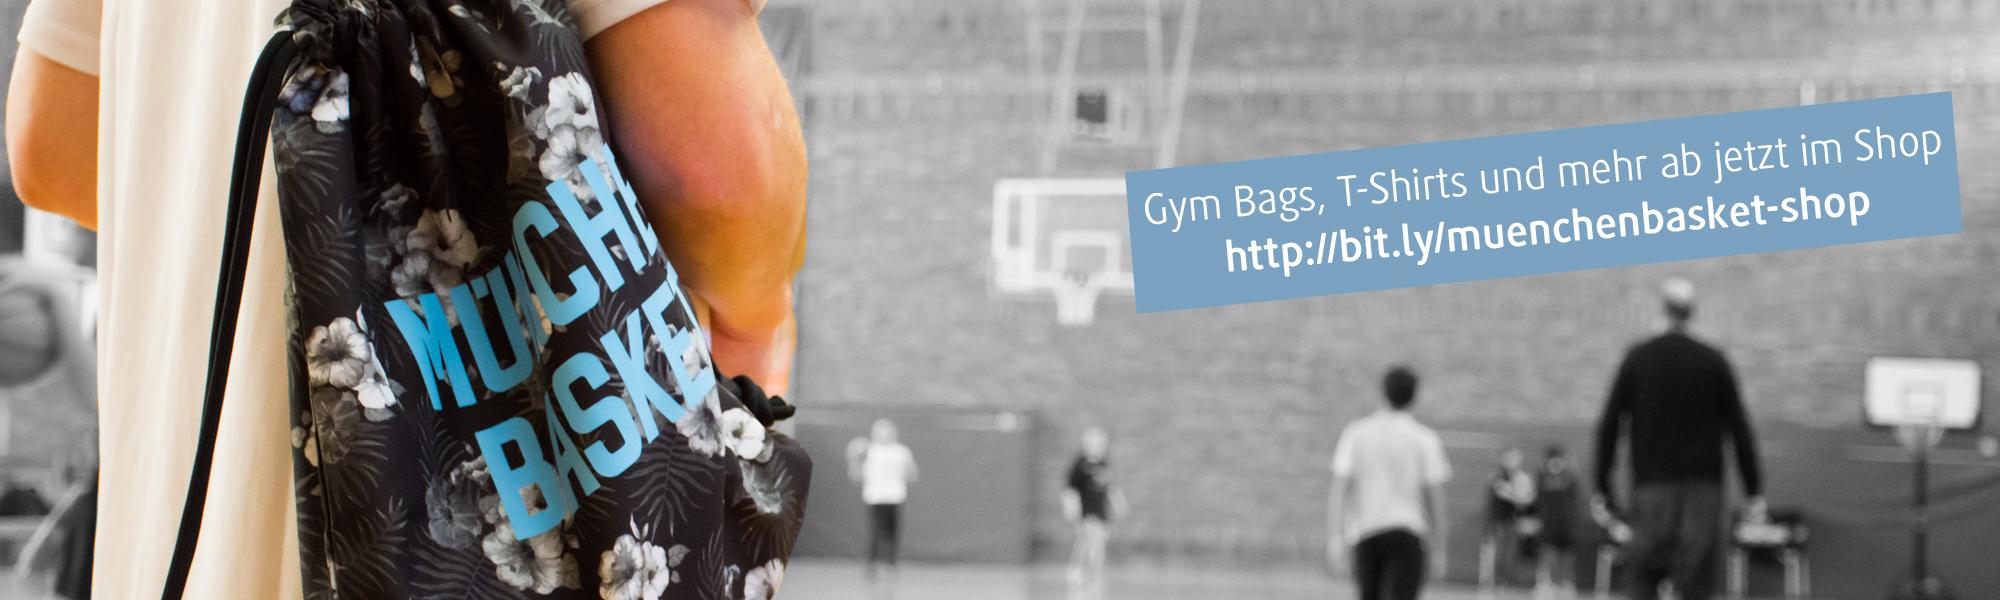 Hole dir jetzt T-Shirts, Gym Bags, Sweatpants mit München Basket Logo